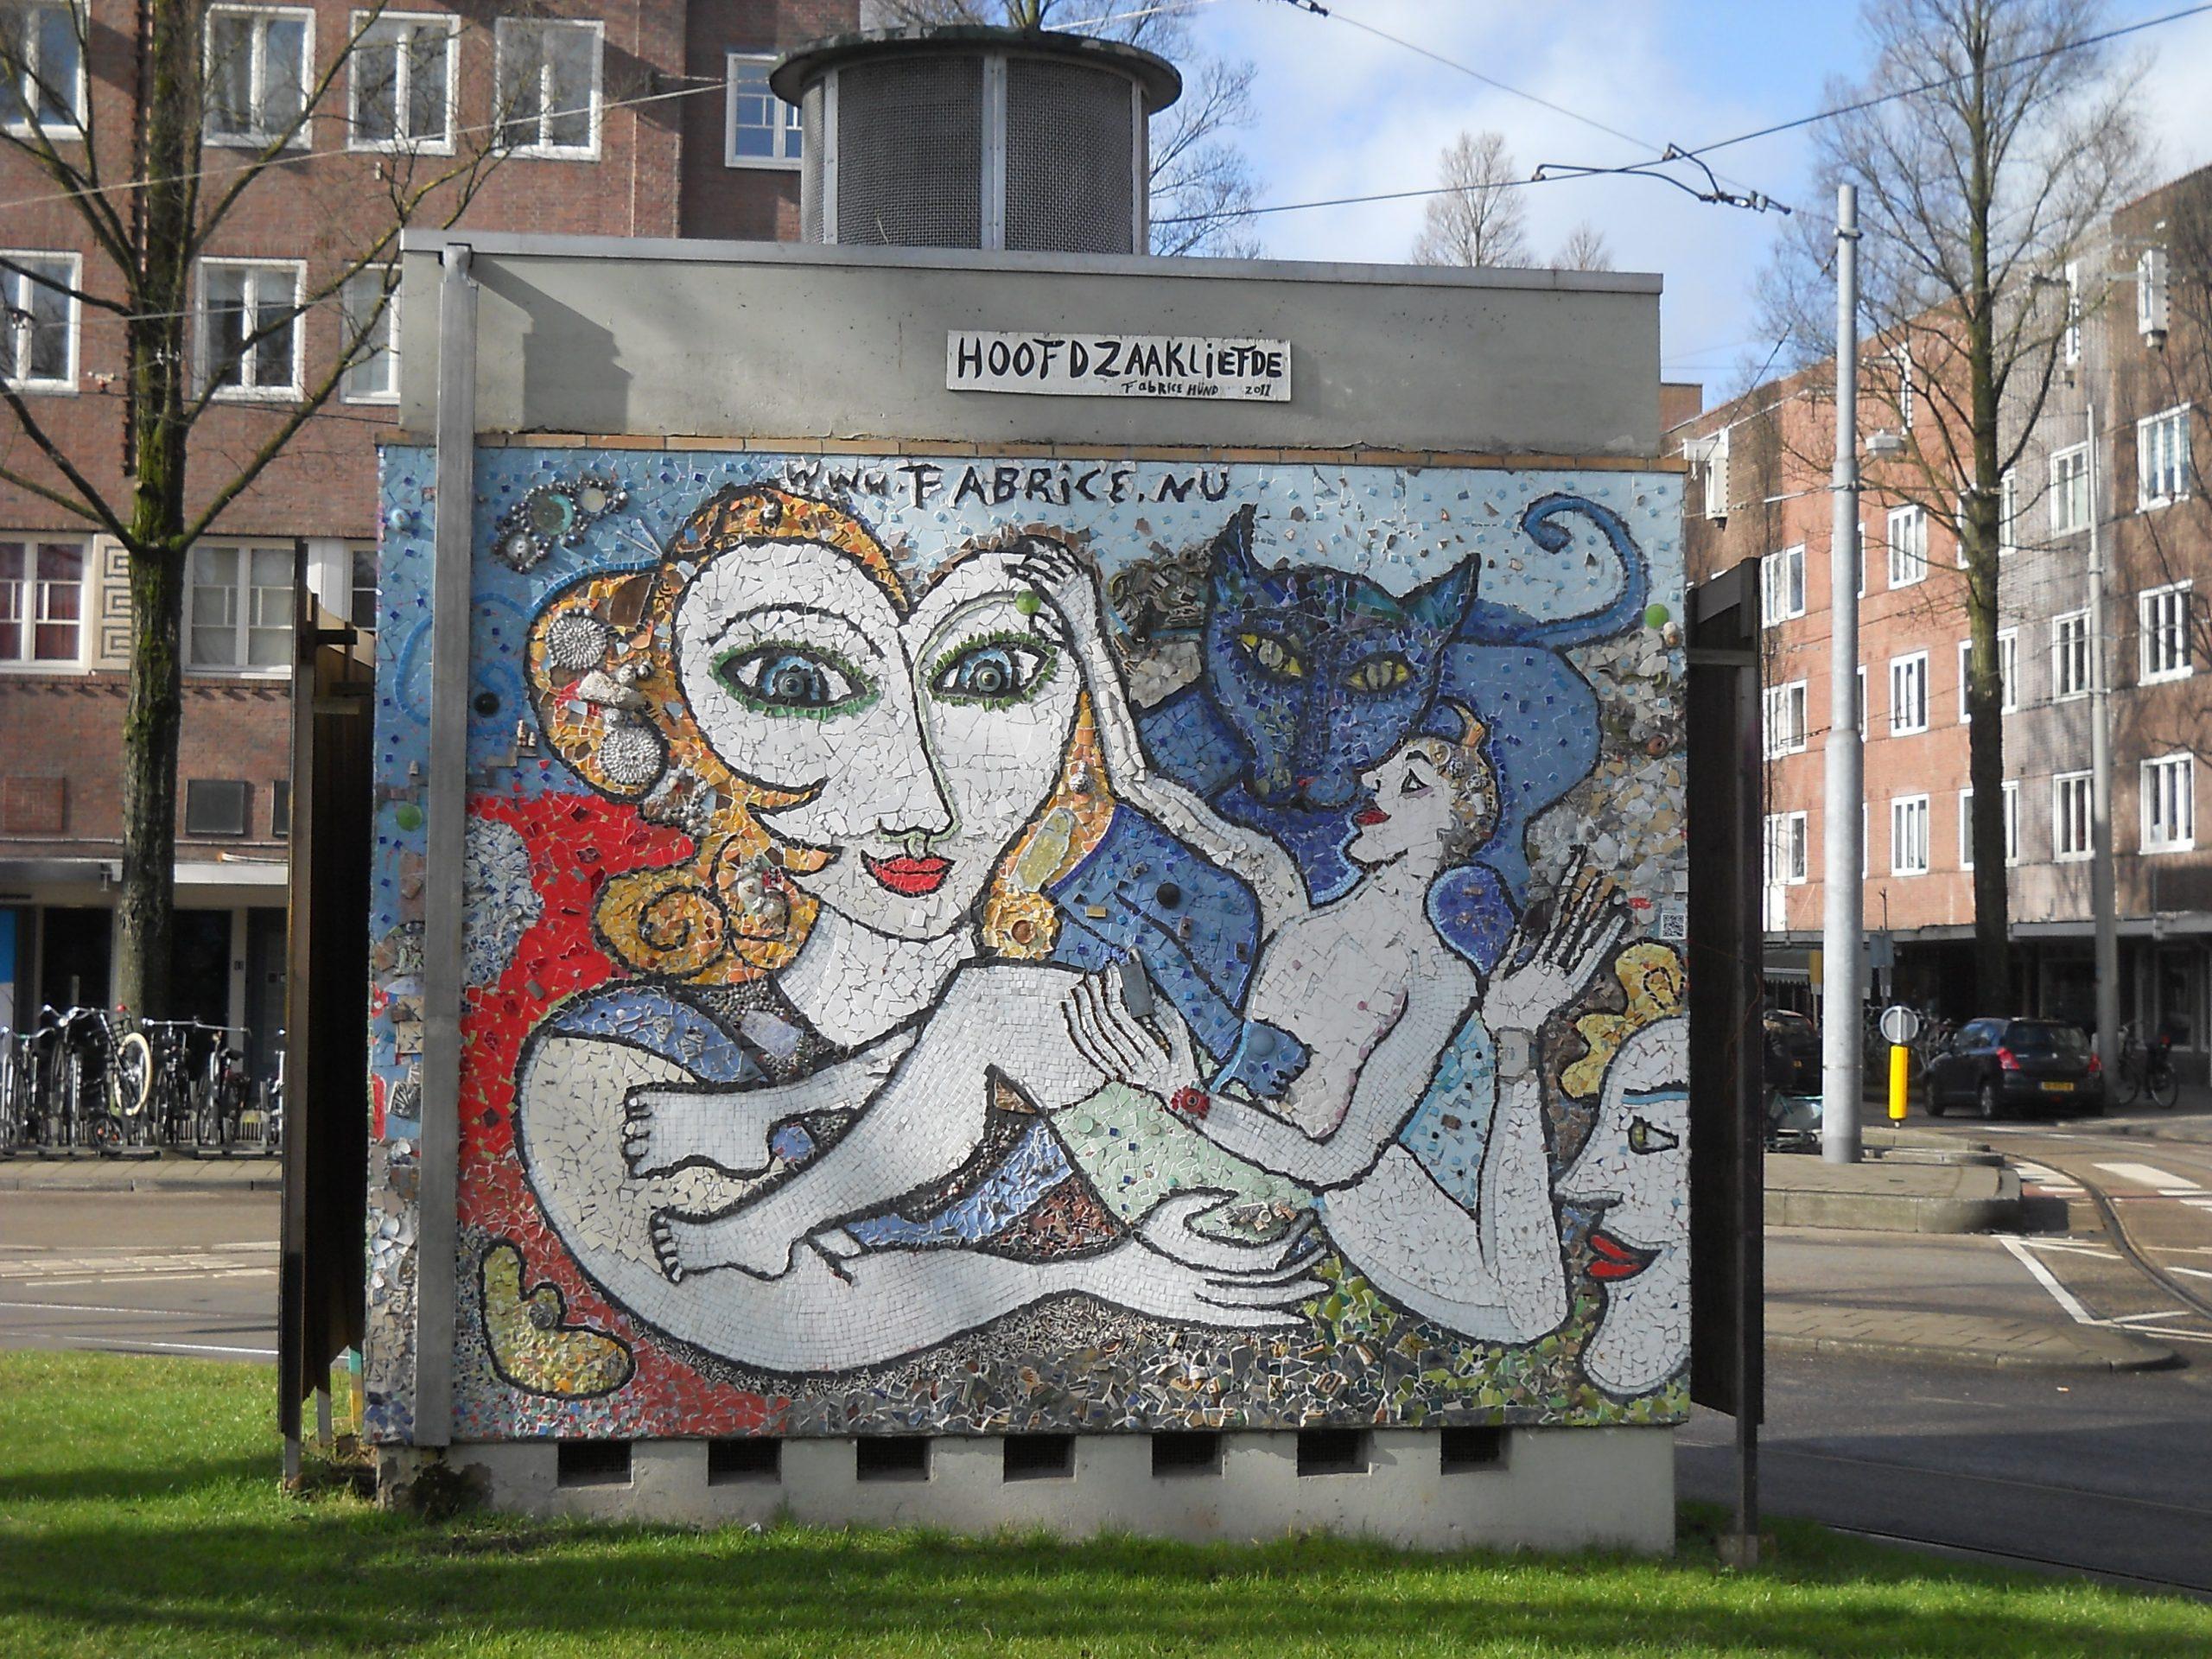 Hoofddorpplein, Amsterdam (2015)